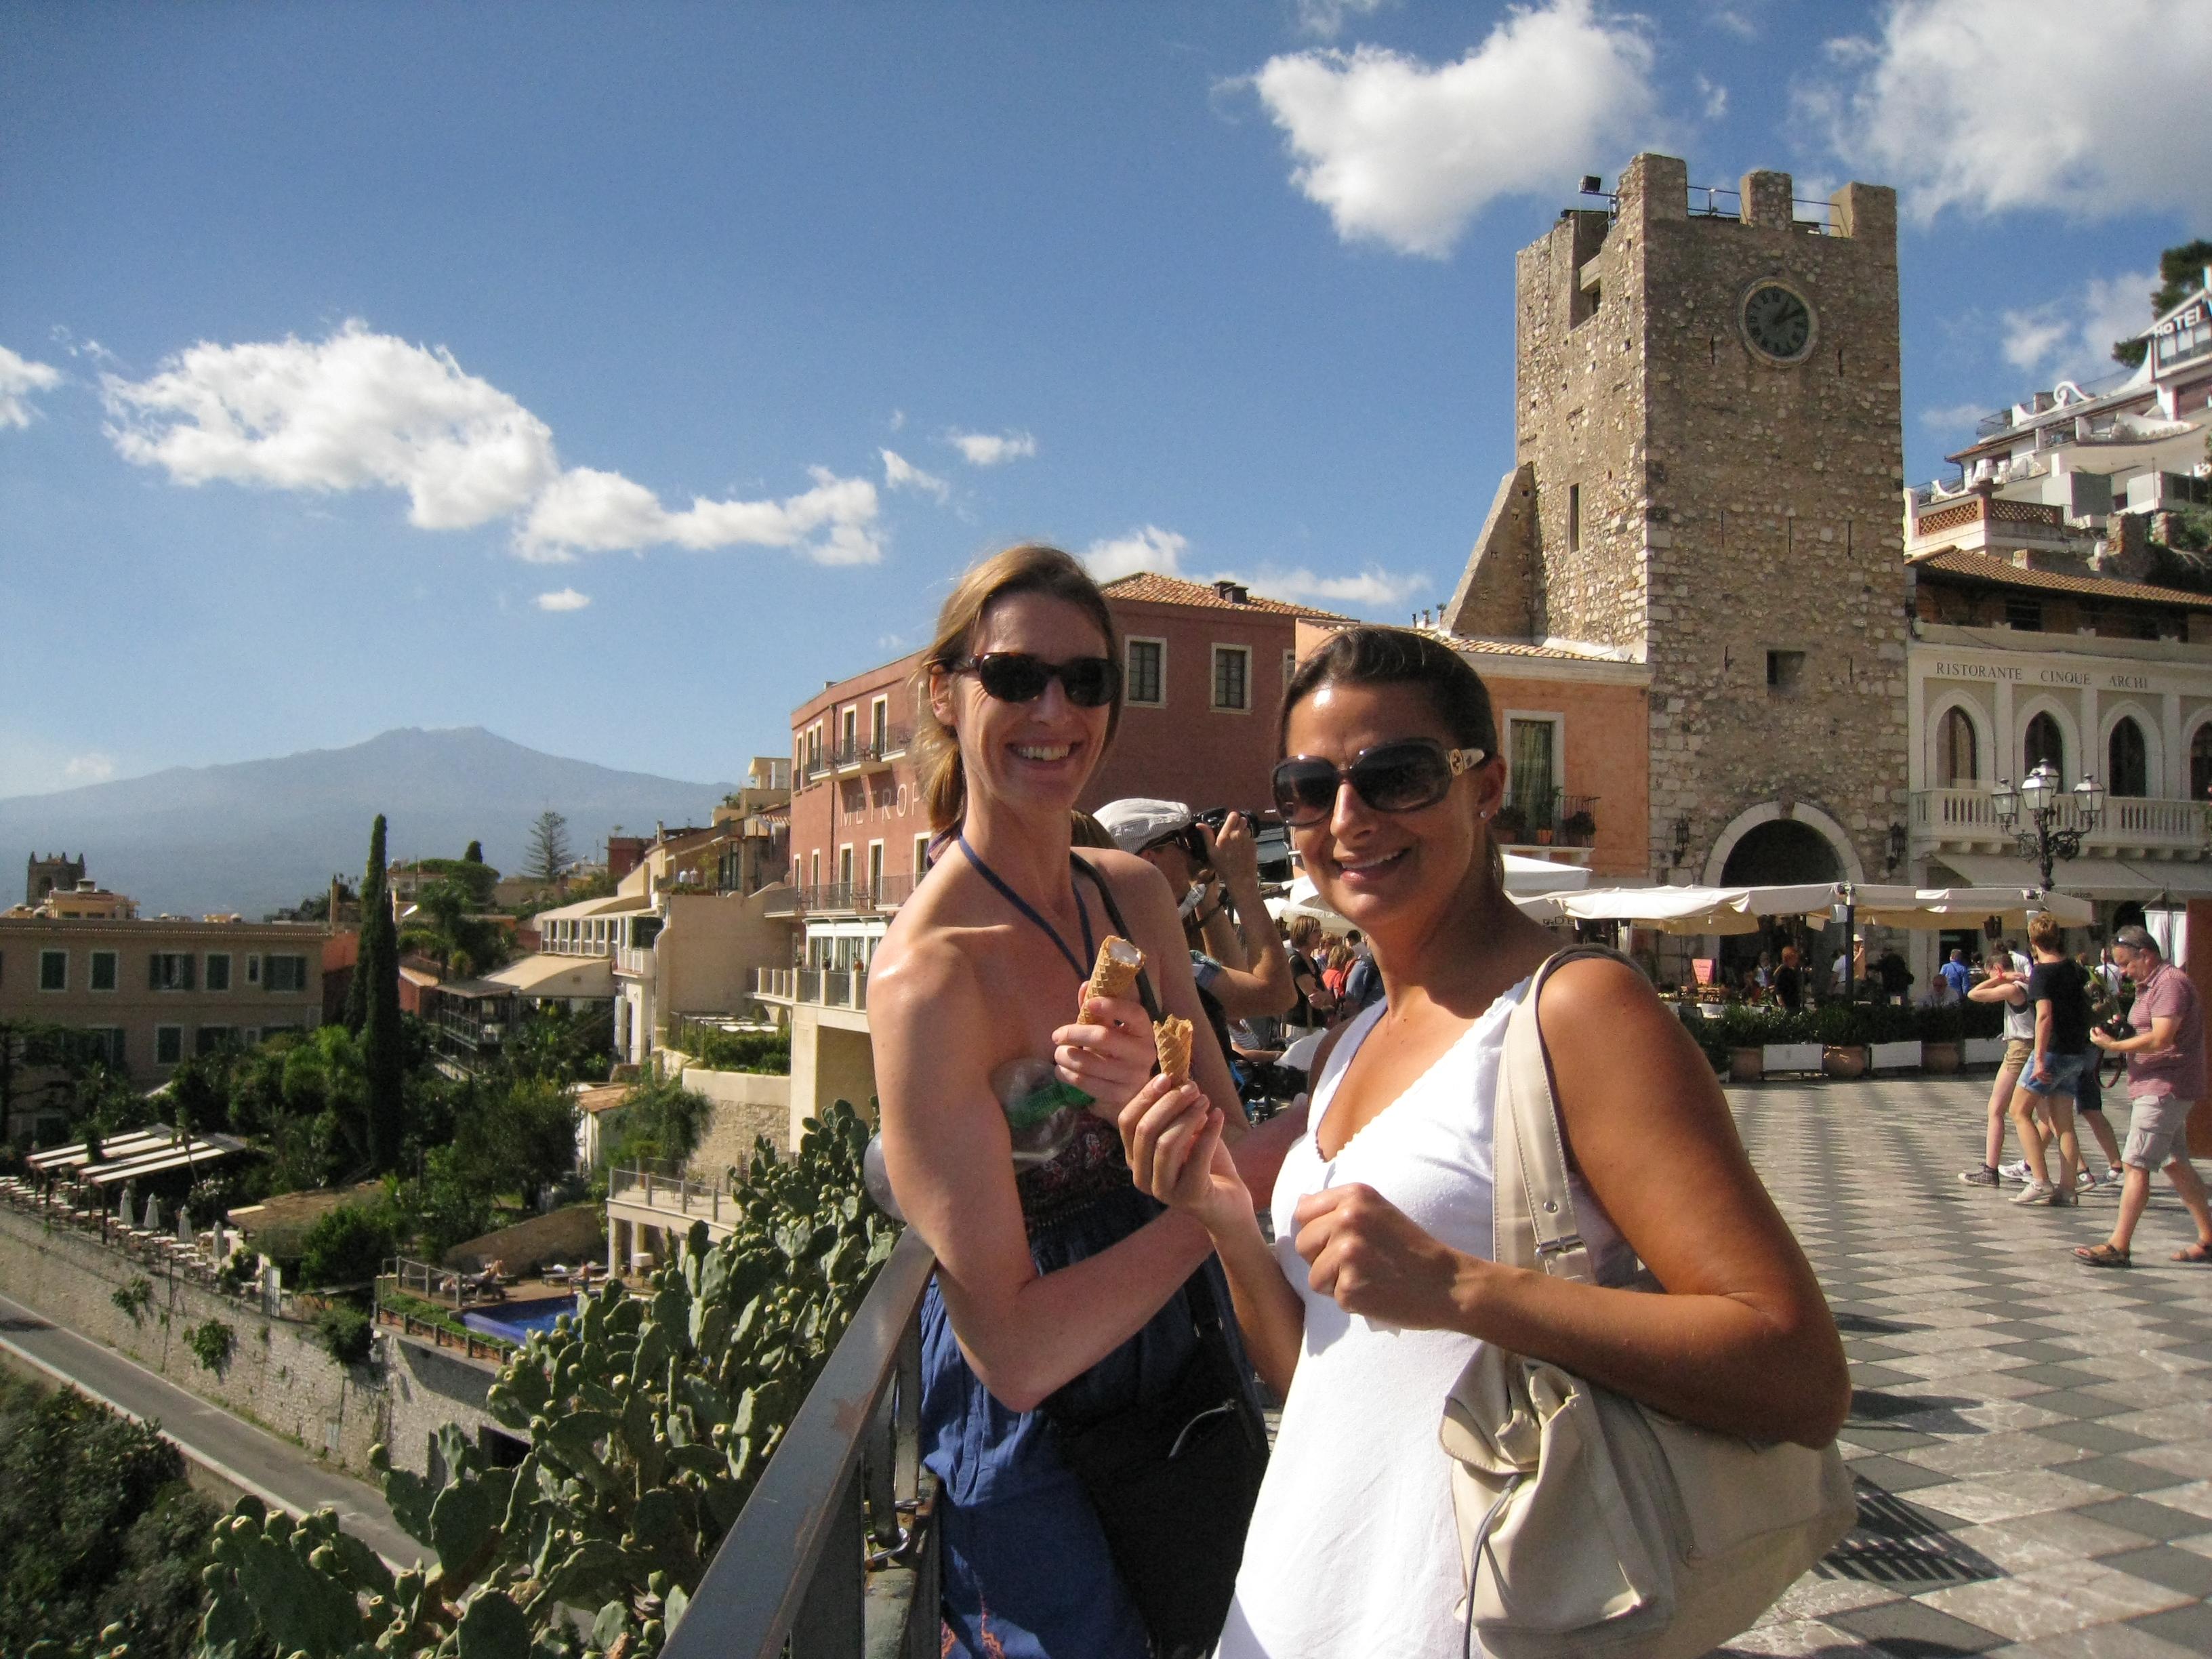 Eating gelato in Taormina